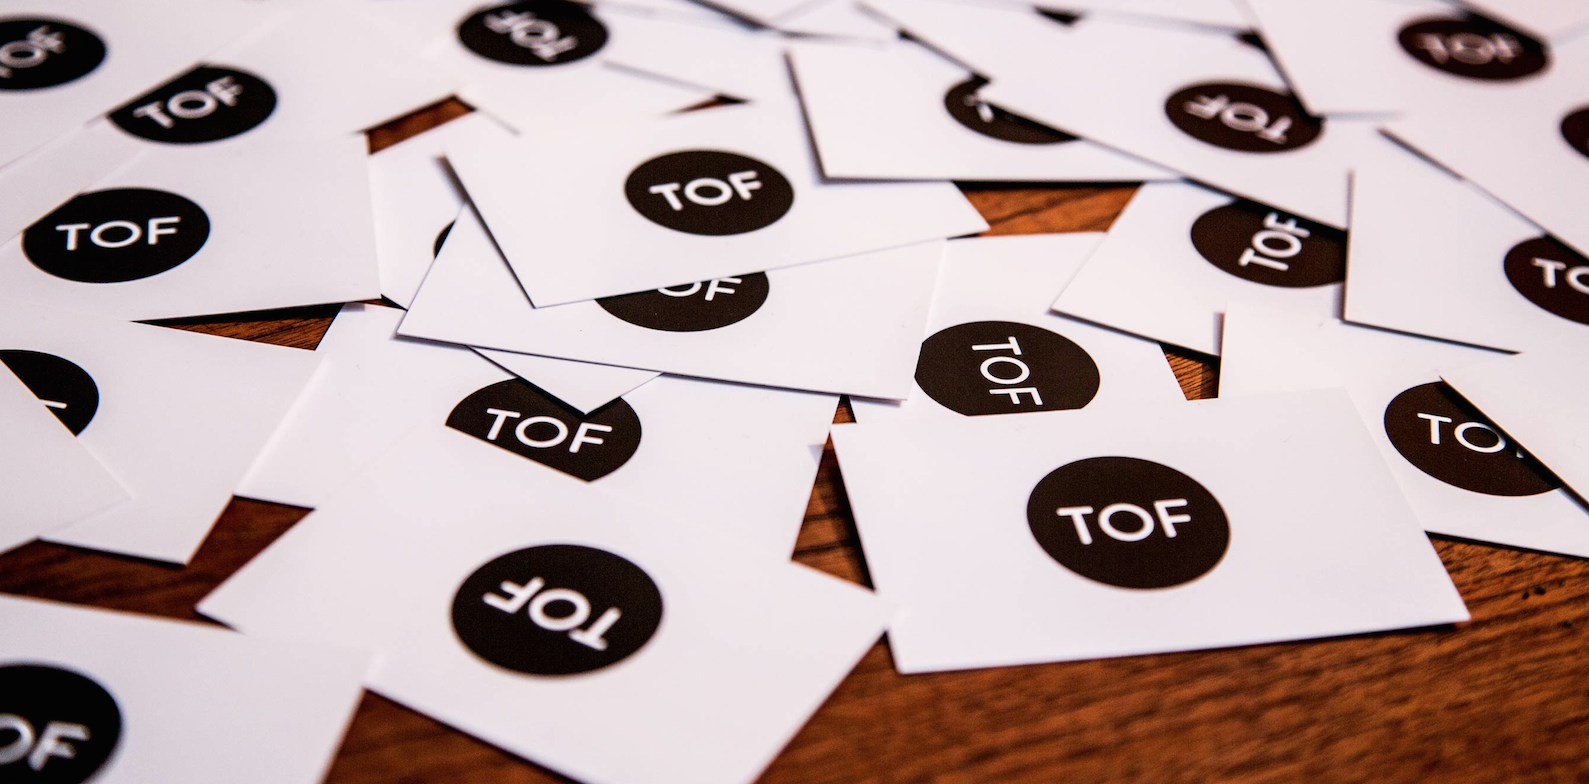 #TofAgency